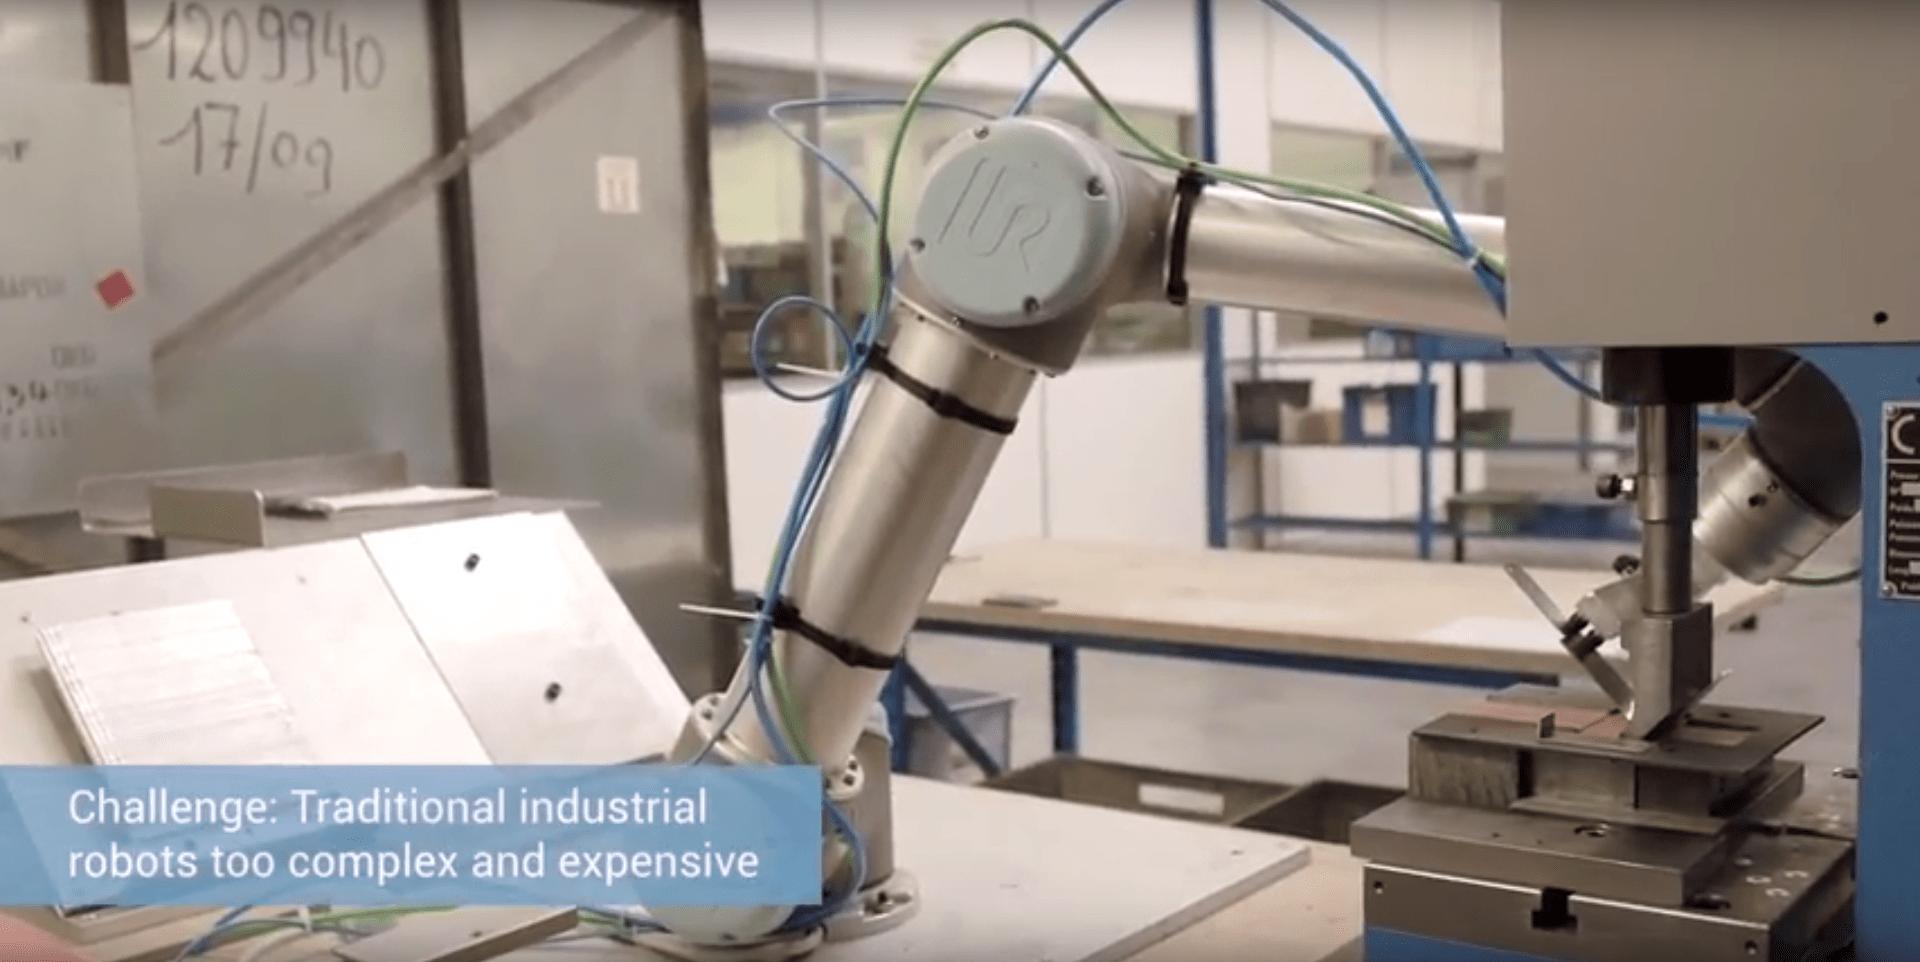 NICHROMINOX COBOT UNIVERSAL ROBOTS HMI MBS CASE STORY